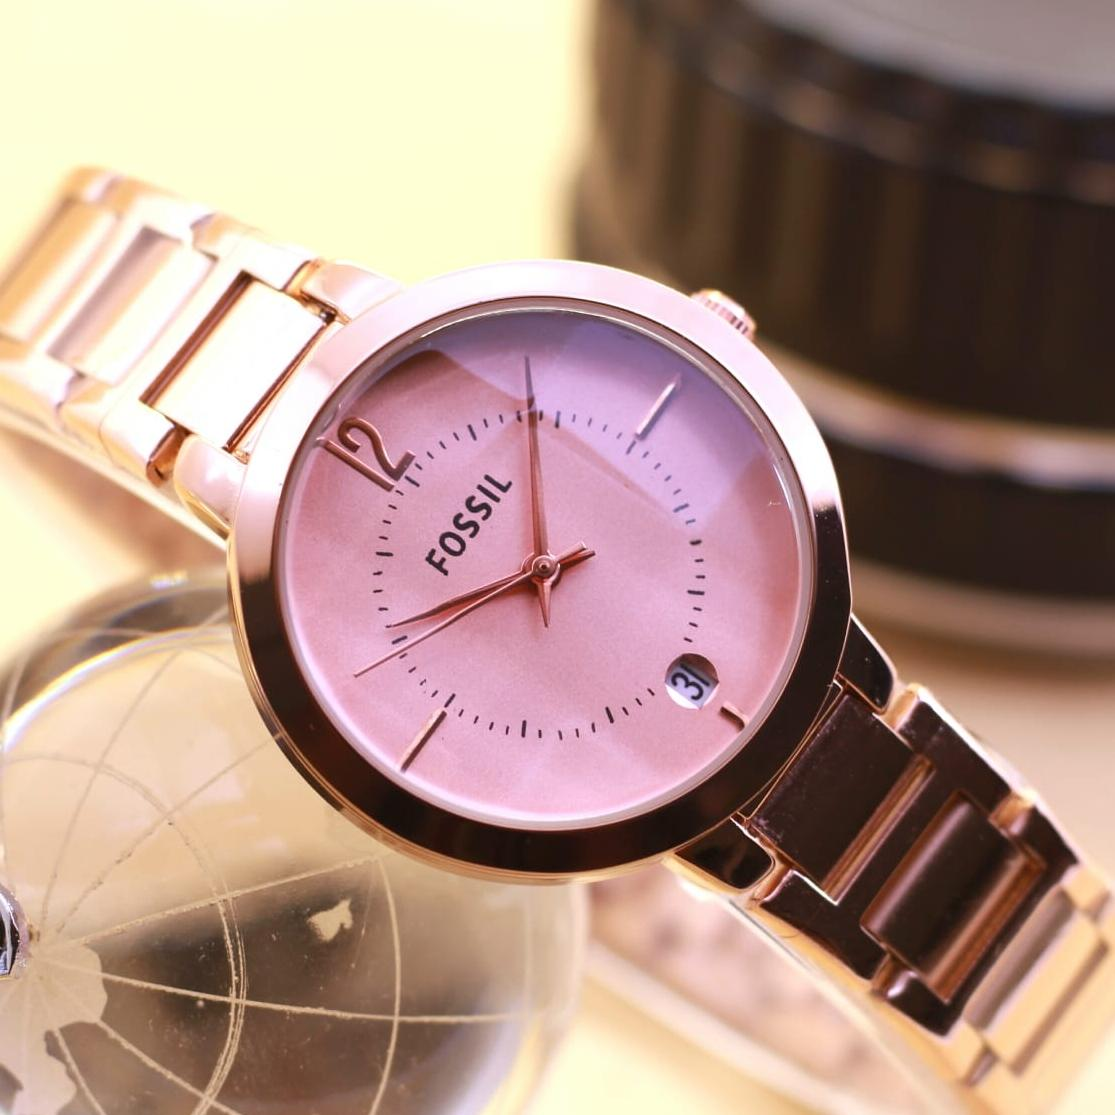 Jam Tangan Wanita Fossil F0707 11 Daftar Harga Terlengkap Indonesia Ch3016 Abilene Chronograph Light Brown Fashion Tgl 3